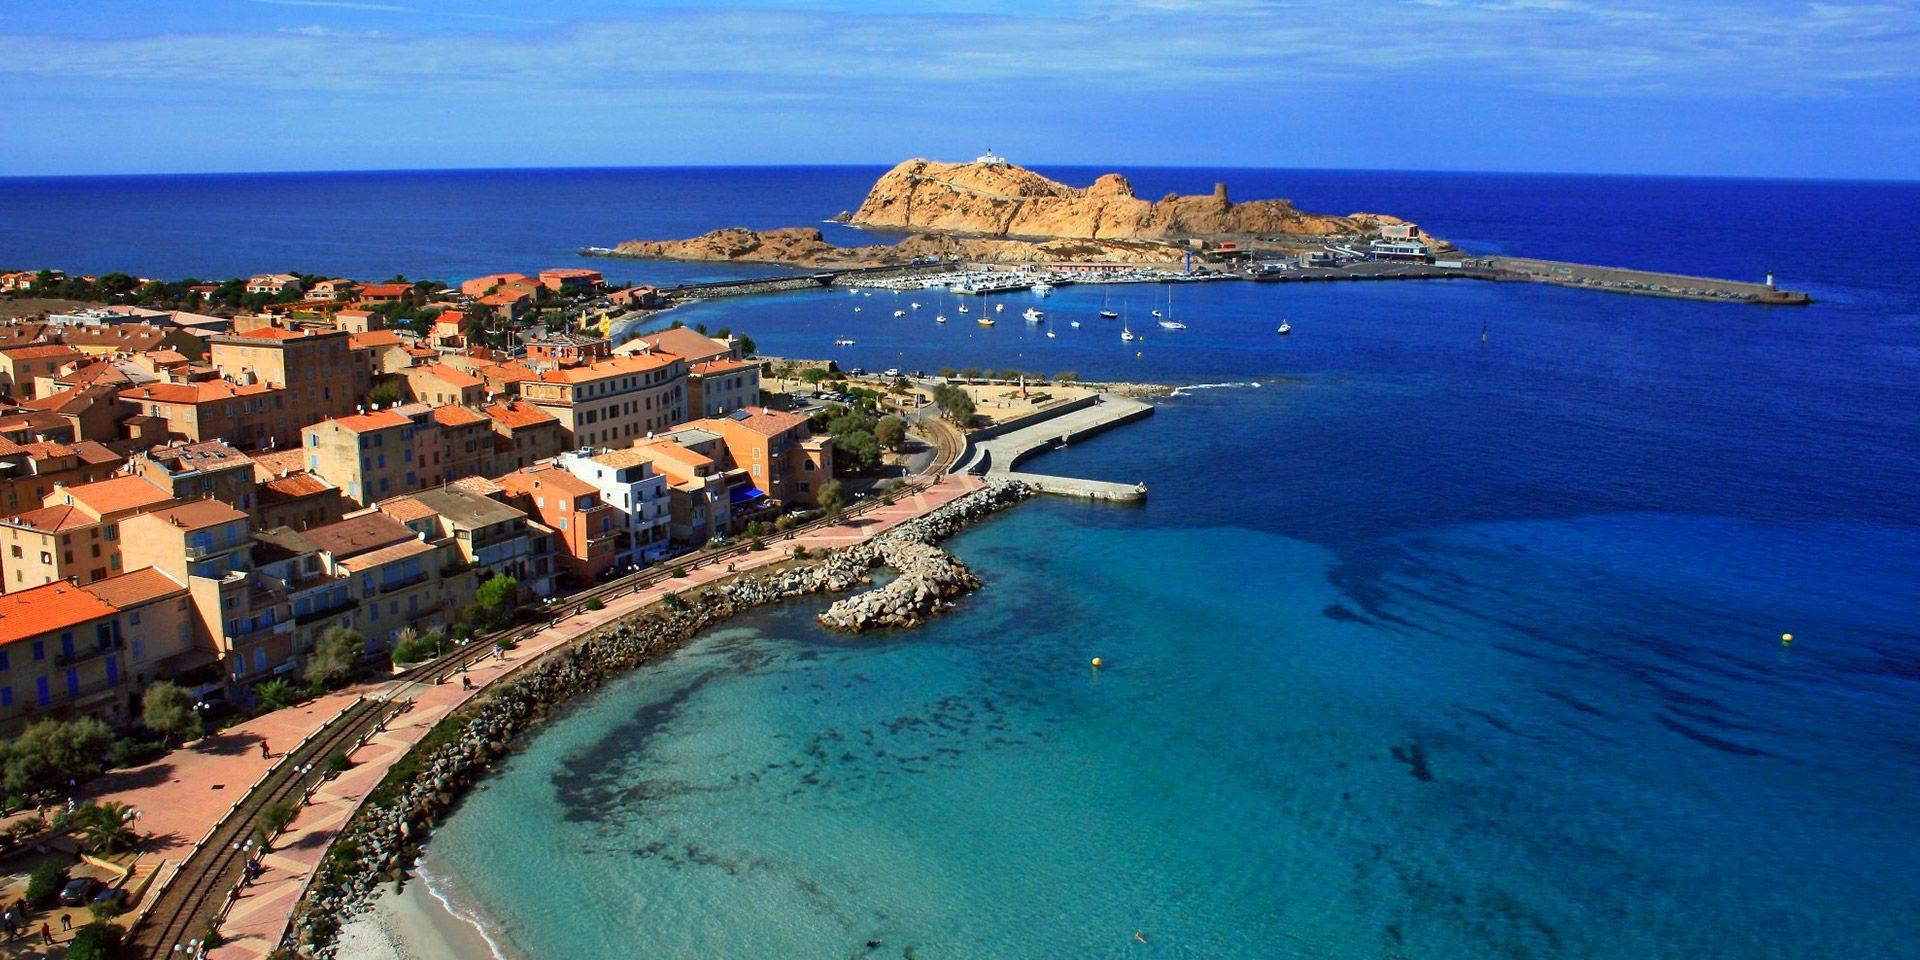 Ile Rousse Corsica Frankrijk luchtfoto drone centrum haven vuurtoren